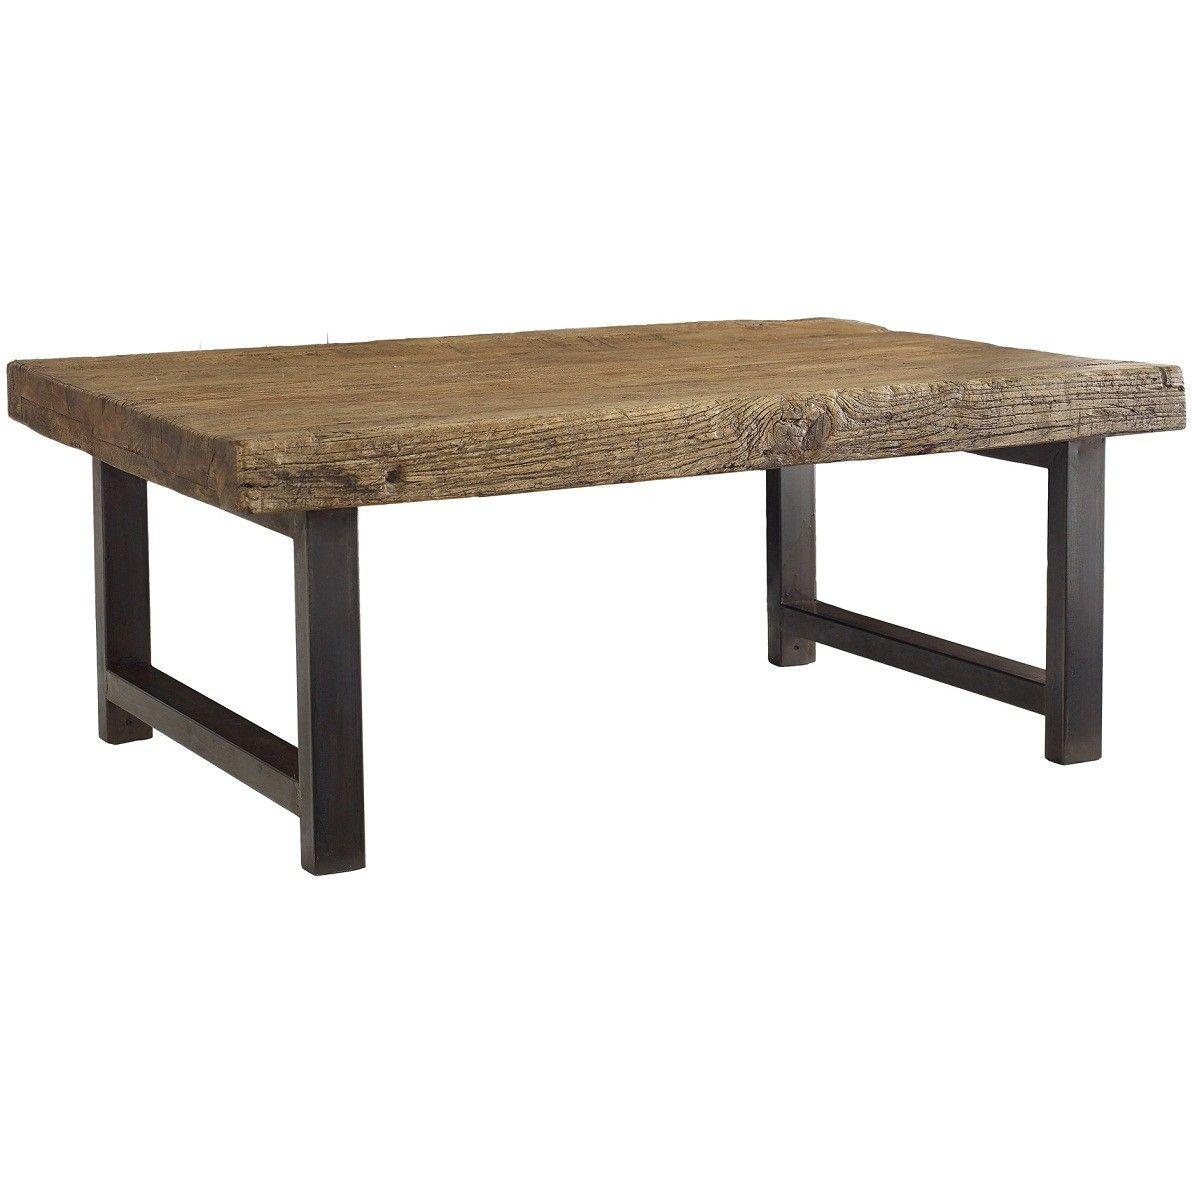 Rustic Metal Table Legs Home Furniture Living Room Rustica Iron Leg Coffee